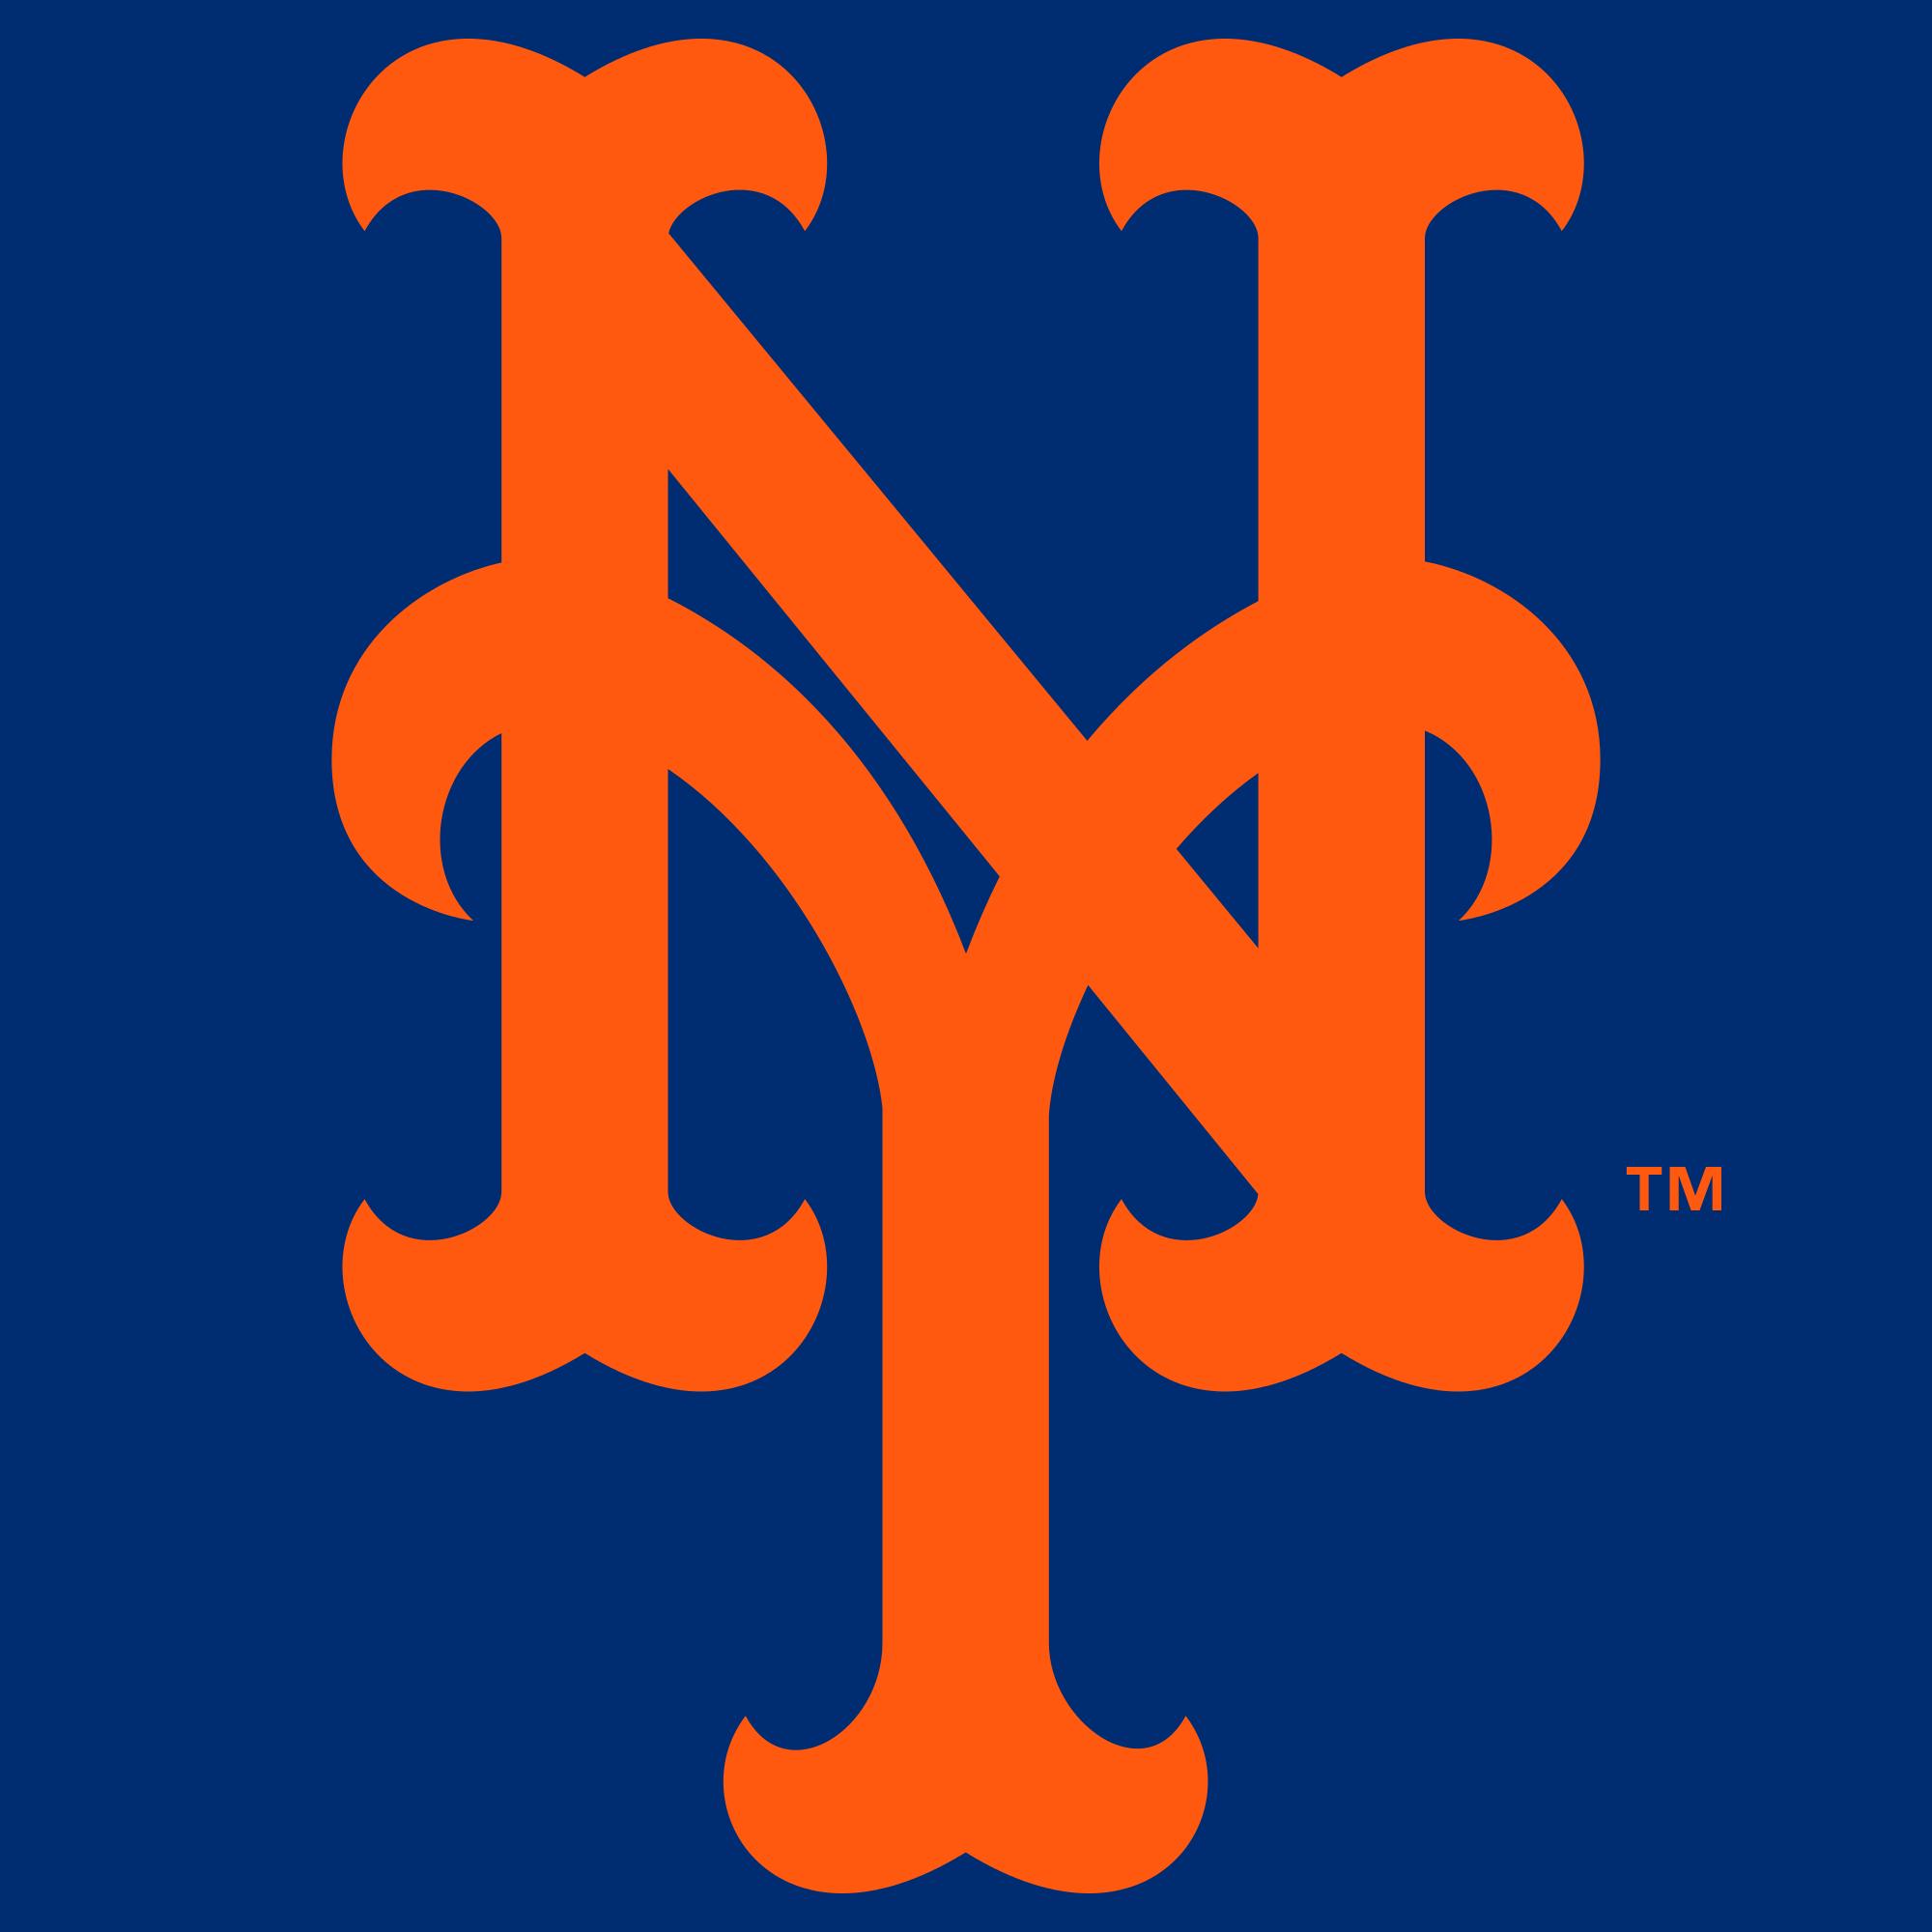 Pin By Paul Ulmer On Baseball Xv New York Mets Logo New York Mets Mets